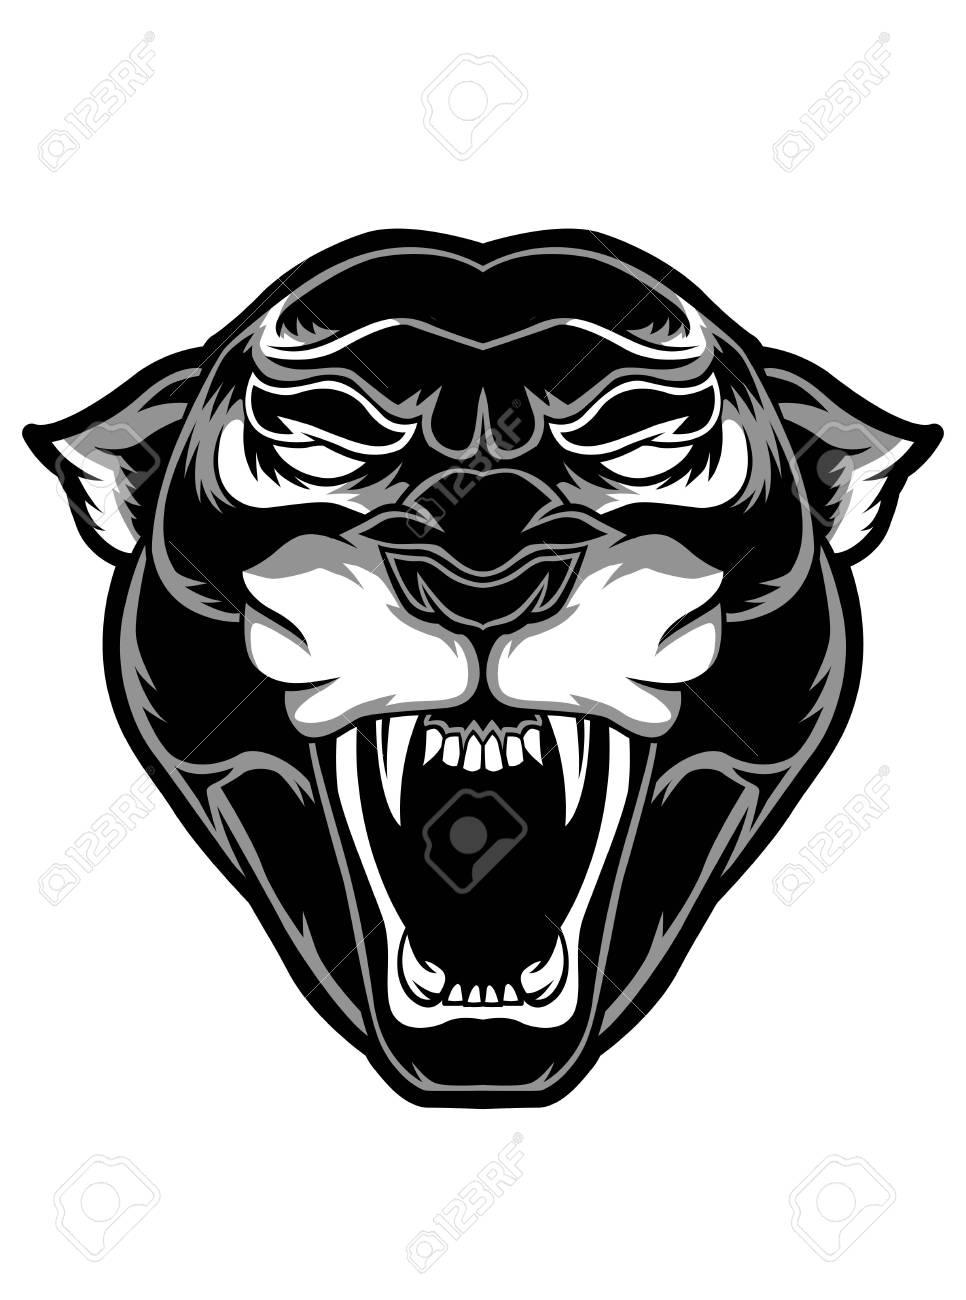 Black panther vector tattoo sticker poster background design banner - 95463170